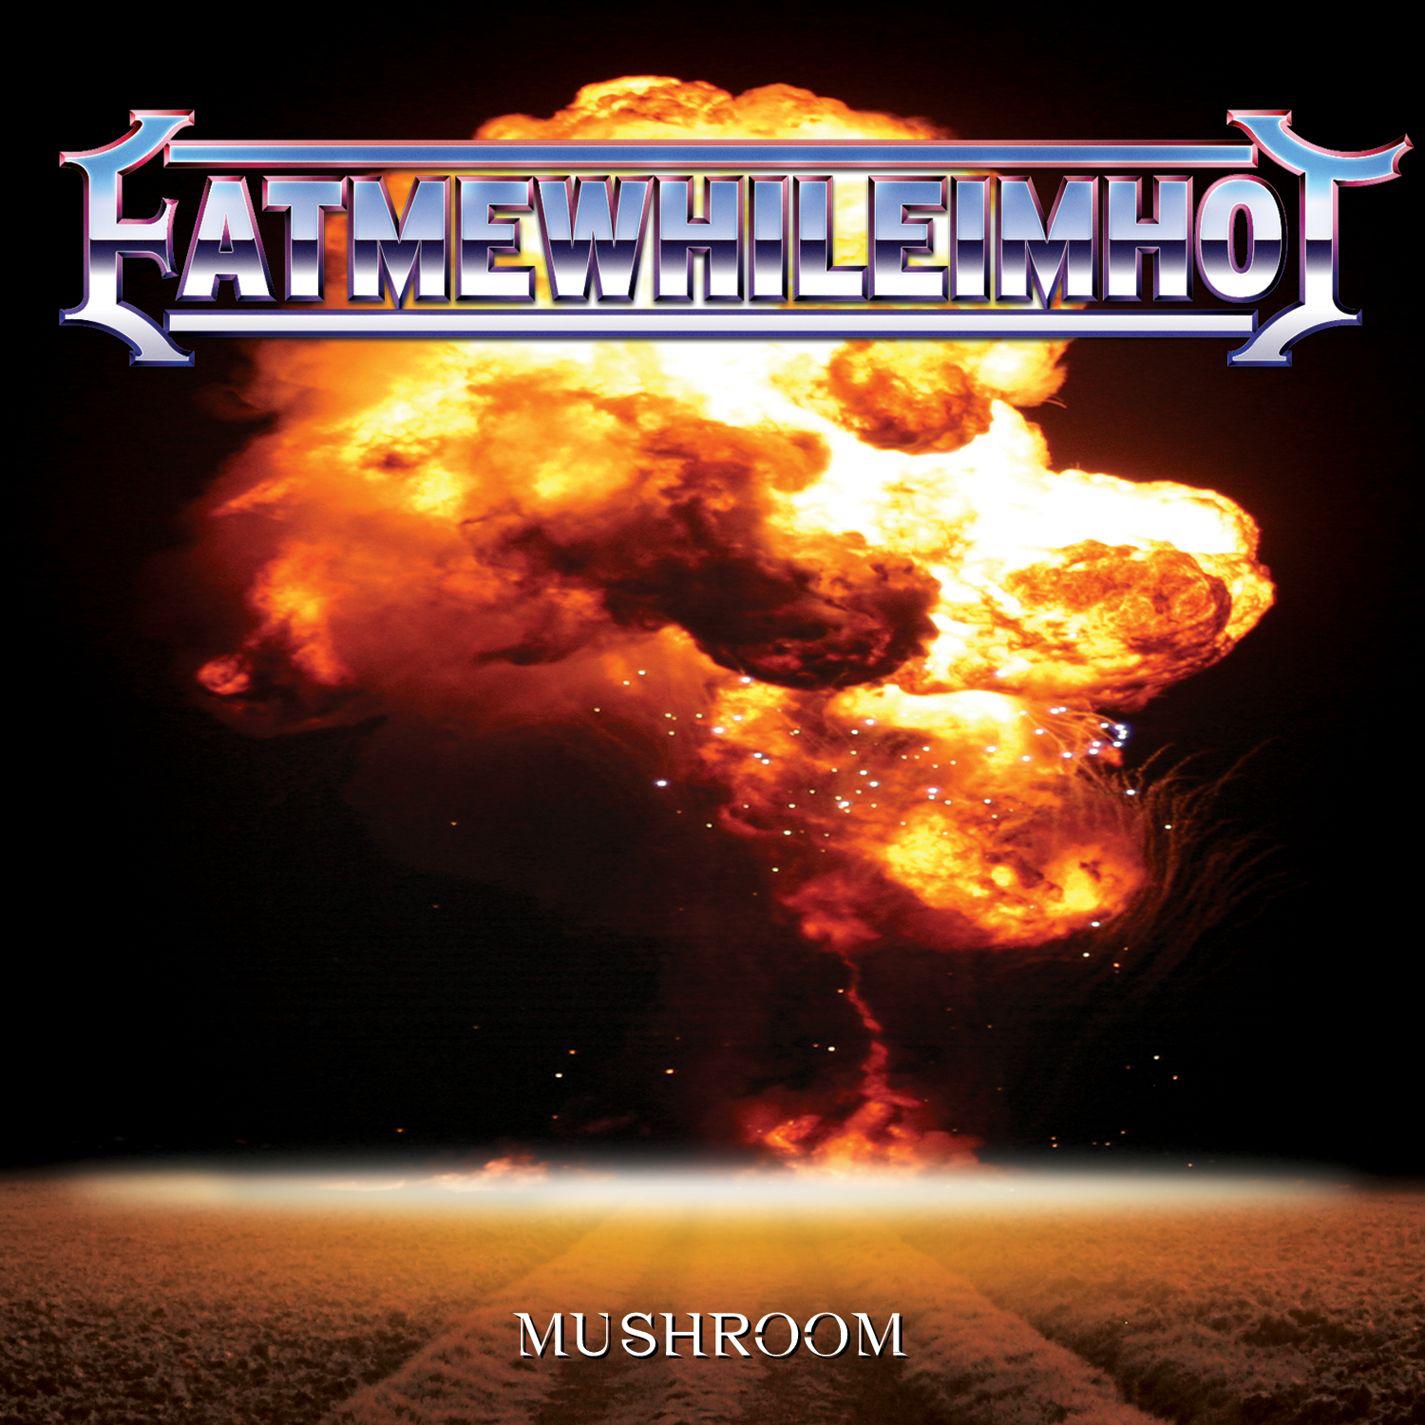 eatmewhileimhot! - Mushroom (2012)